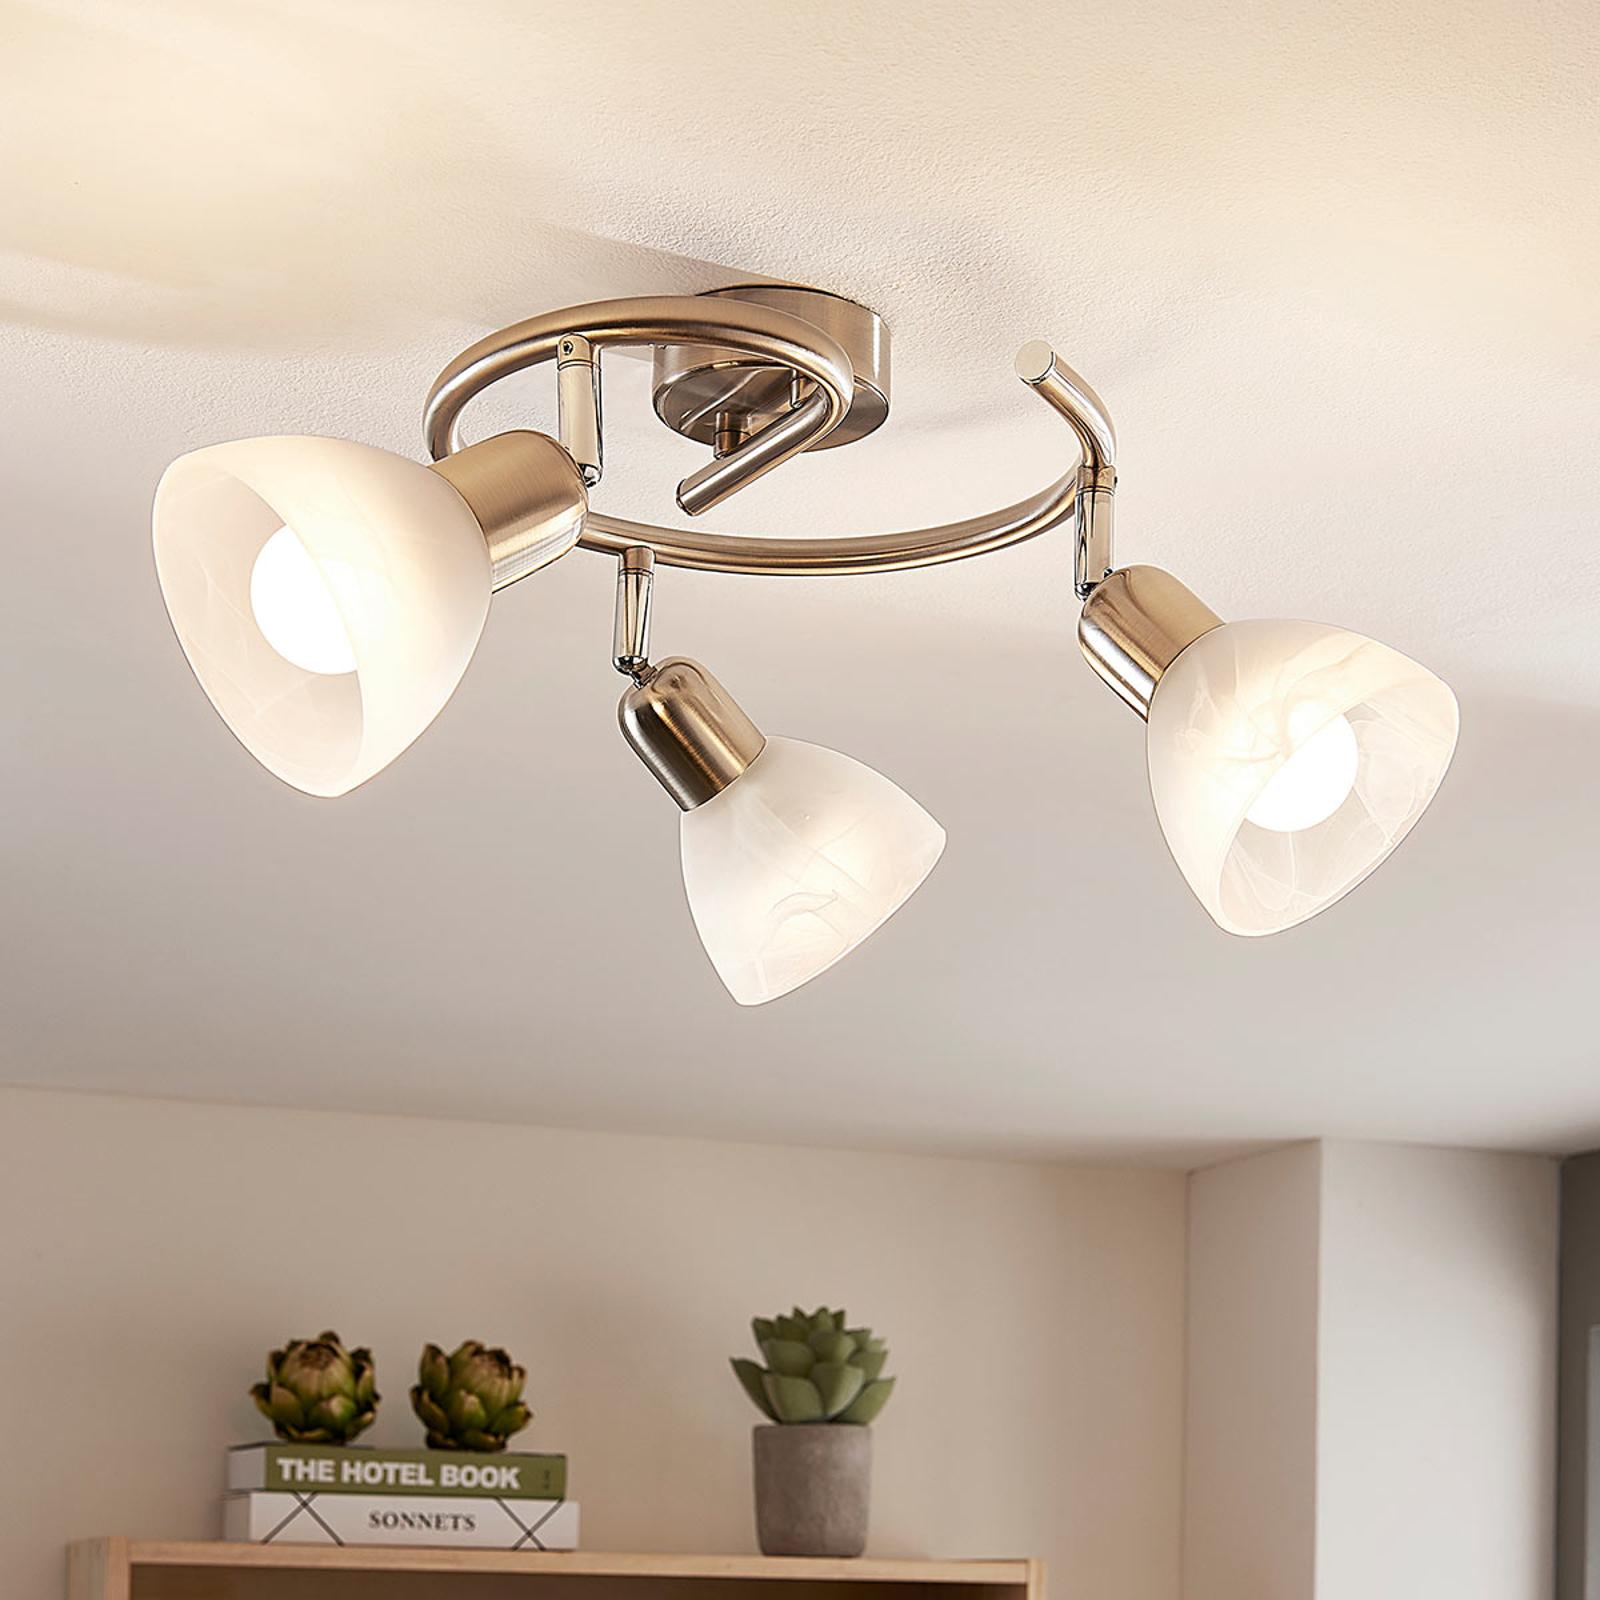 Lampa sufitowa LED Paulina, białe klosze